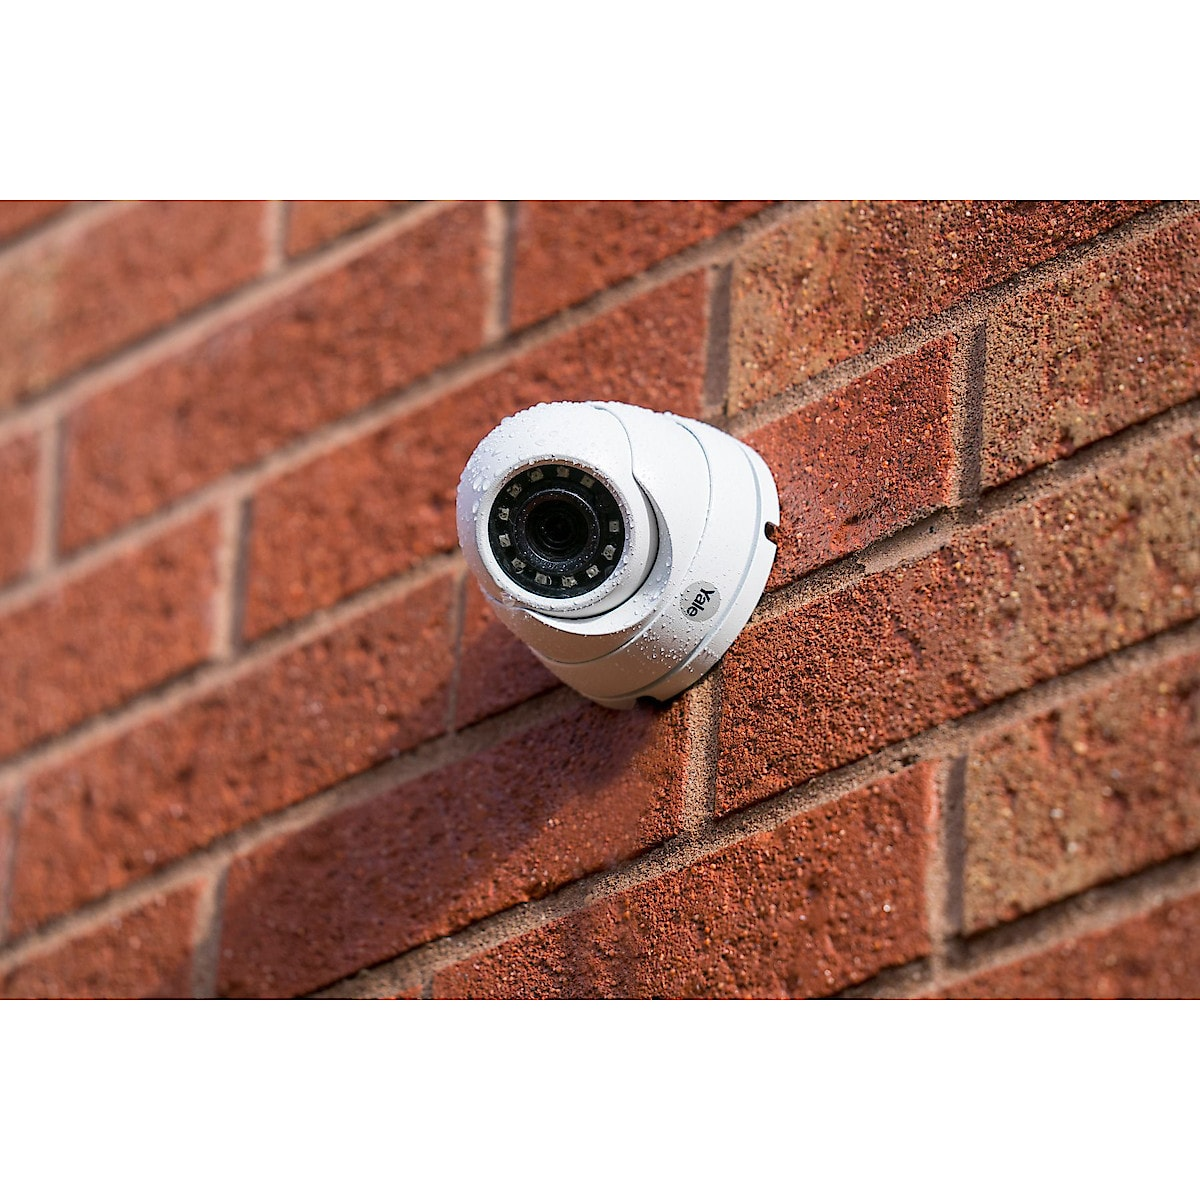 Yale Smart Home CCTV Dome Camera HD1080